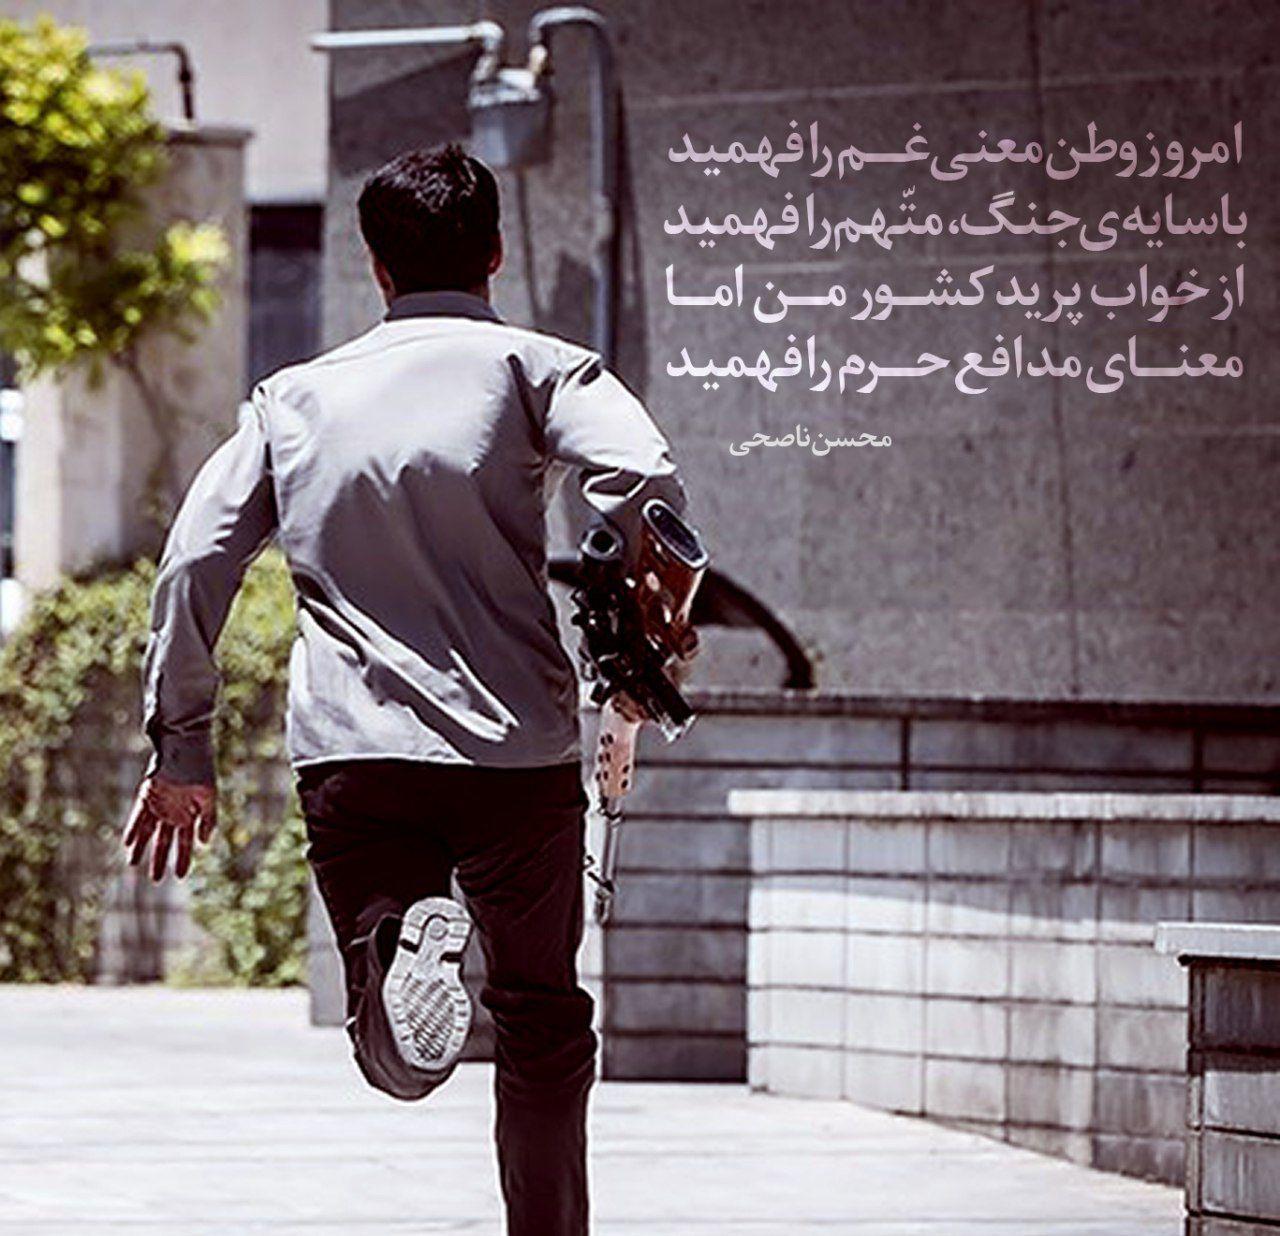 http://kajavehdaran.samenblog.com/uploads/k/kajavehdaran/384000.jpg